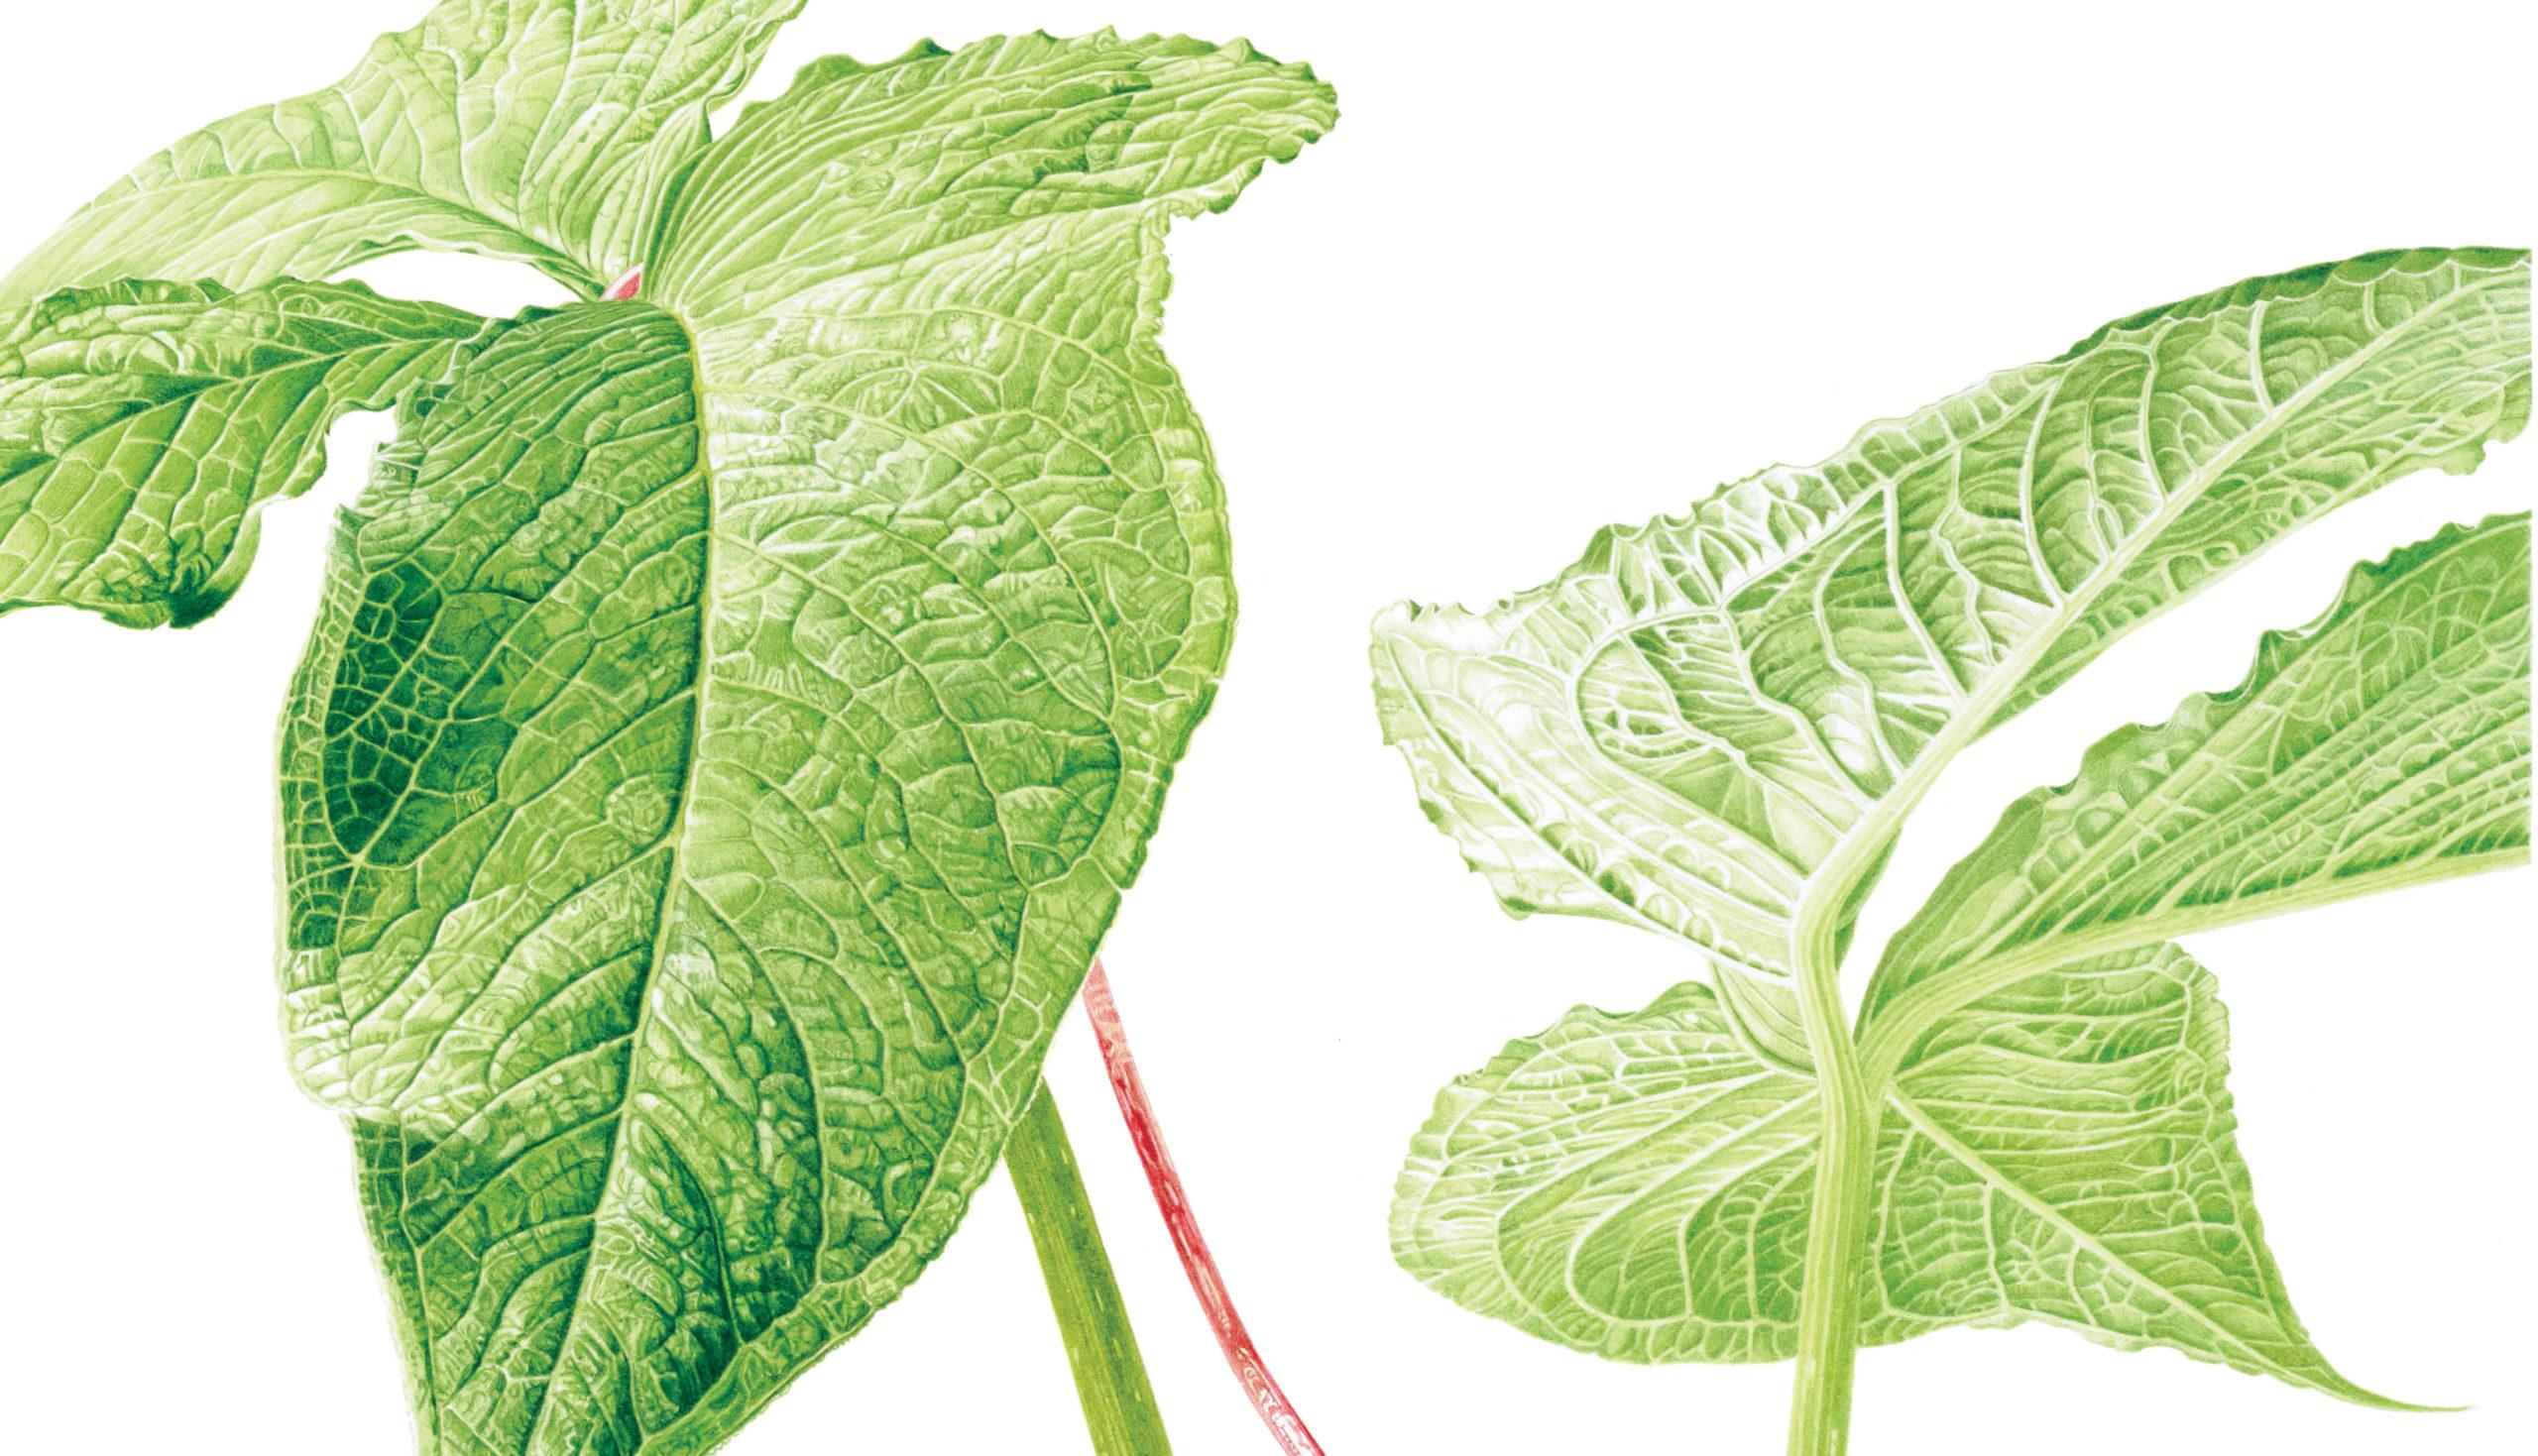 Arisaema intermedium watercolour on Fabriano 5 - detail